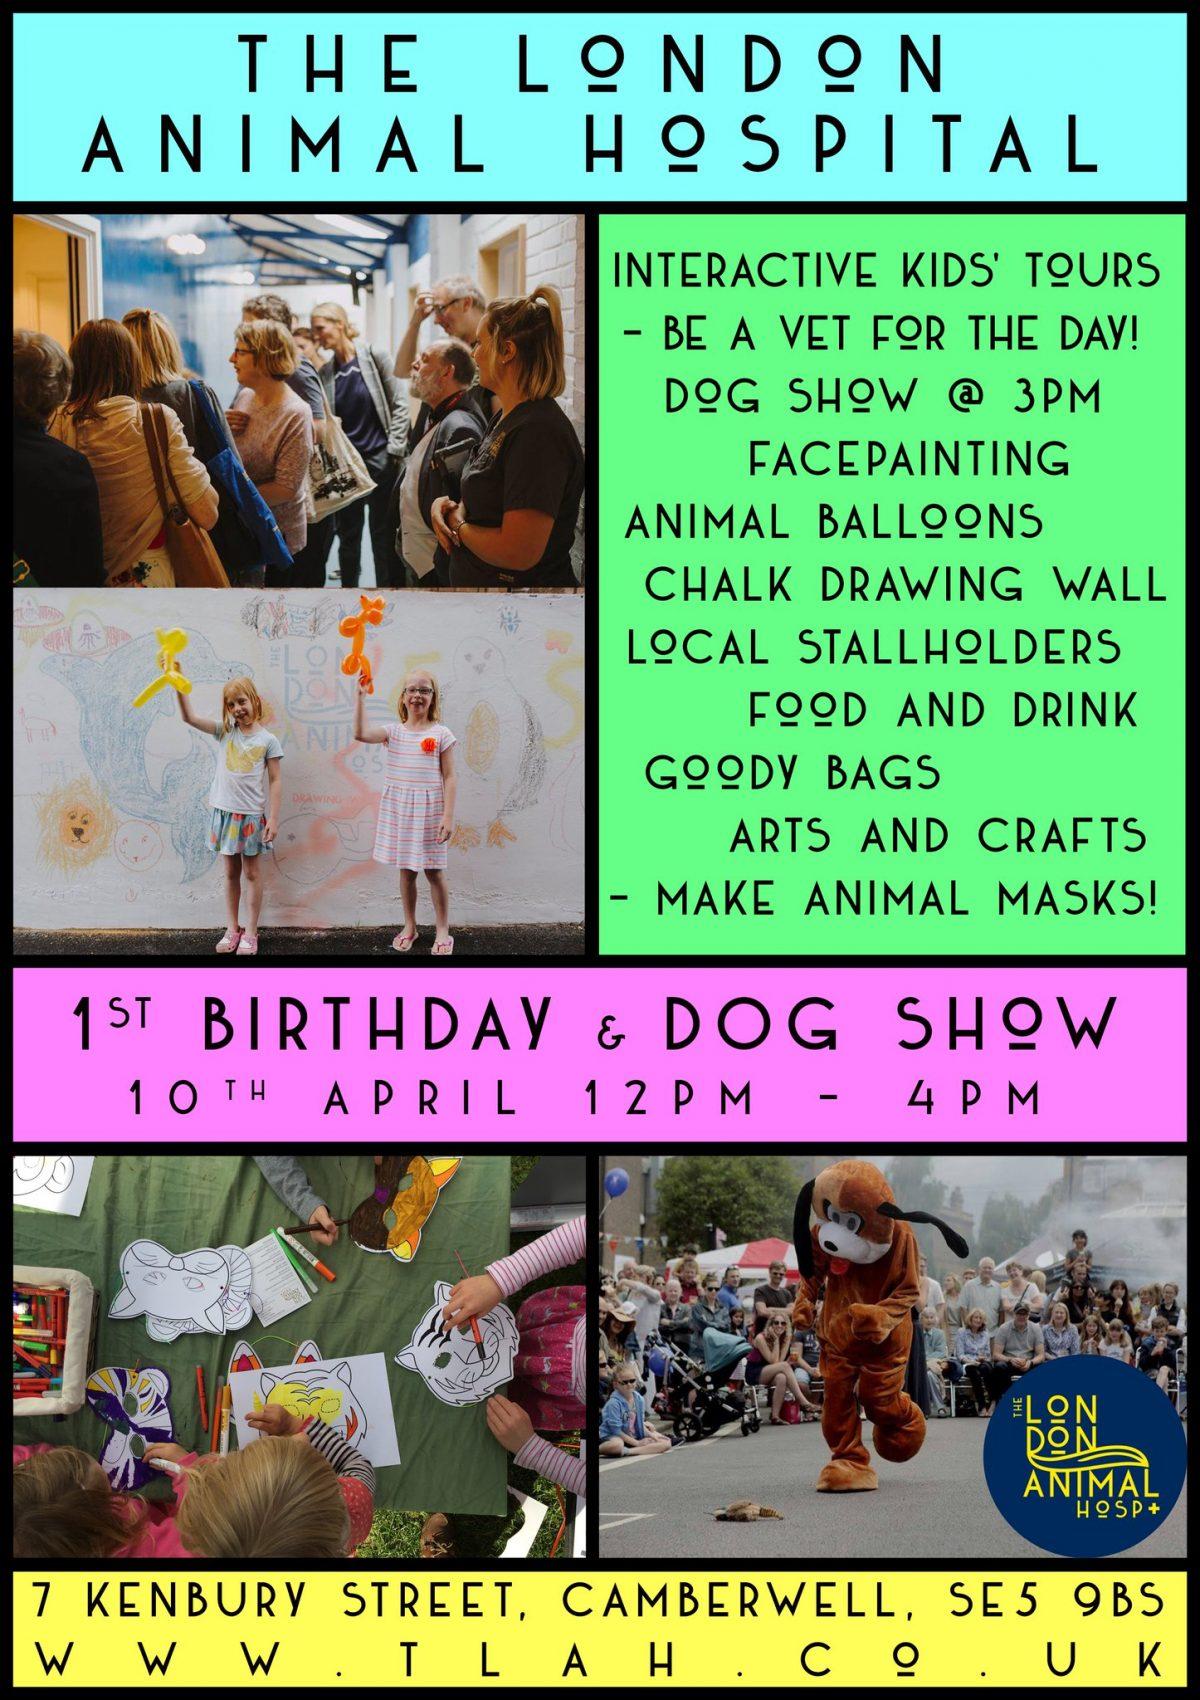 The London Animal Hospital Dog Show